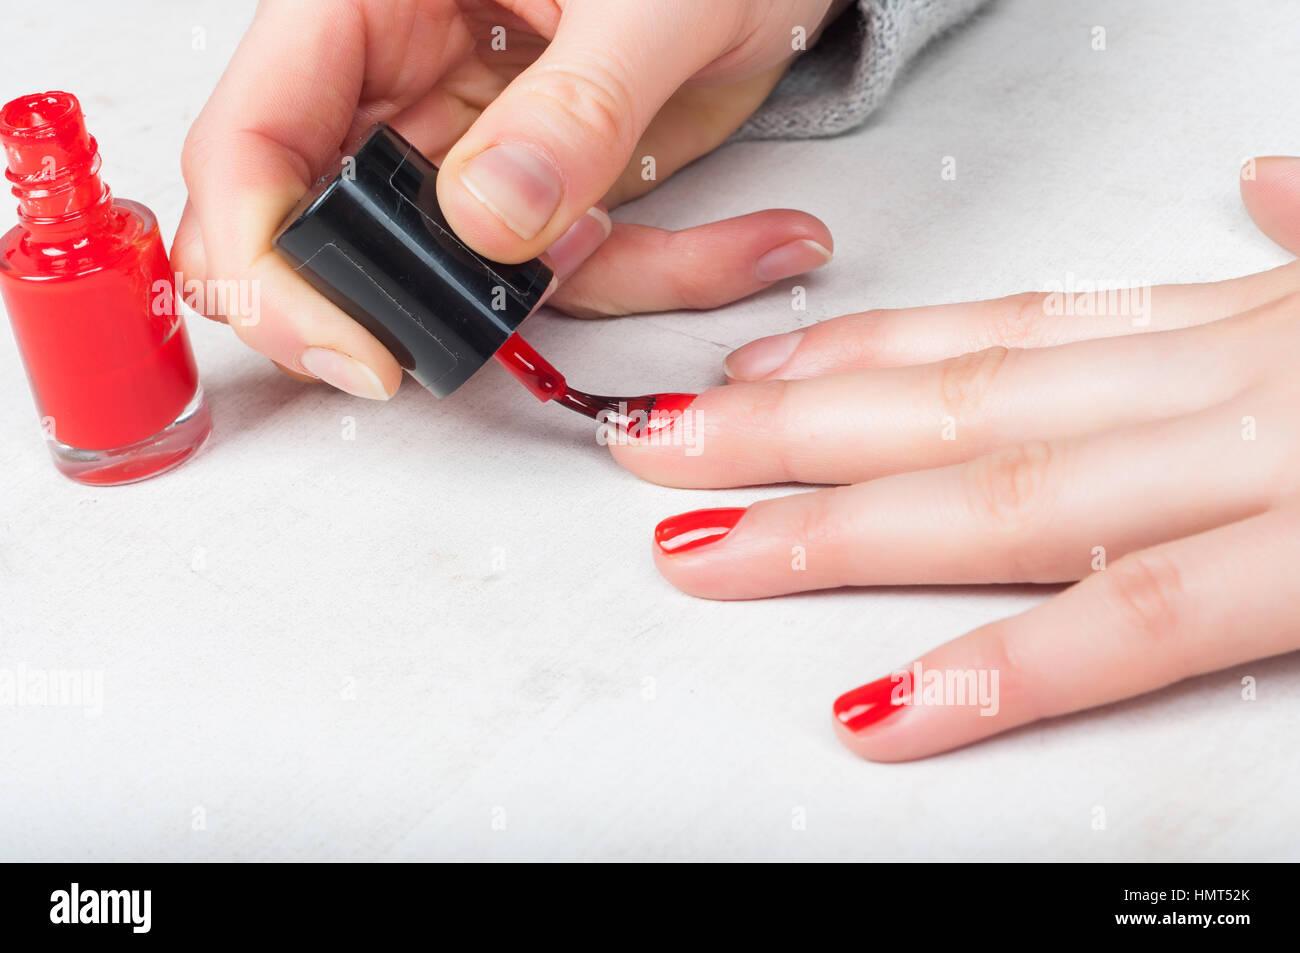 Using applicator brush to apply red polish to fingernail, self made ...